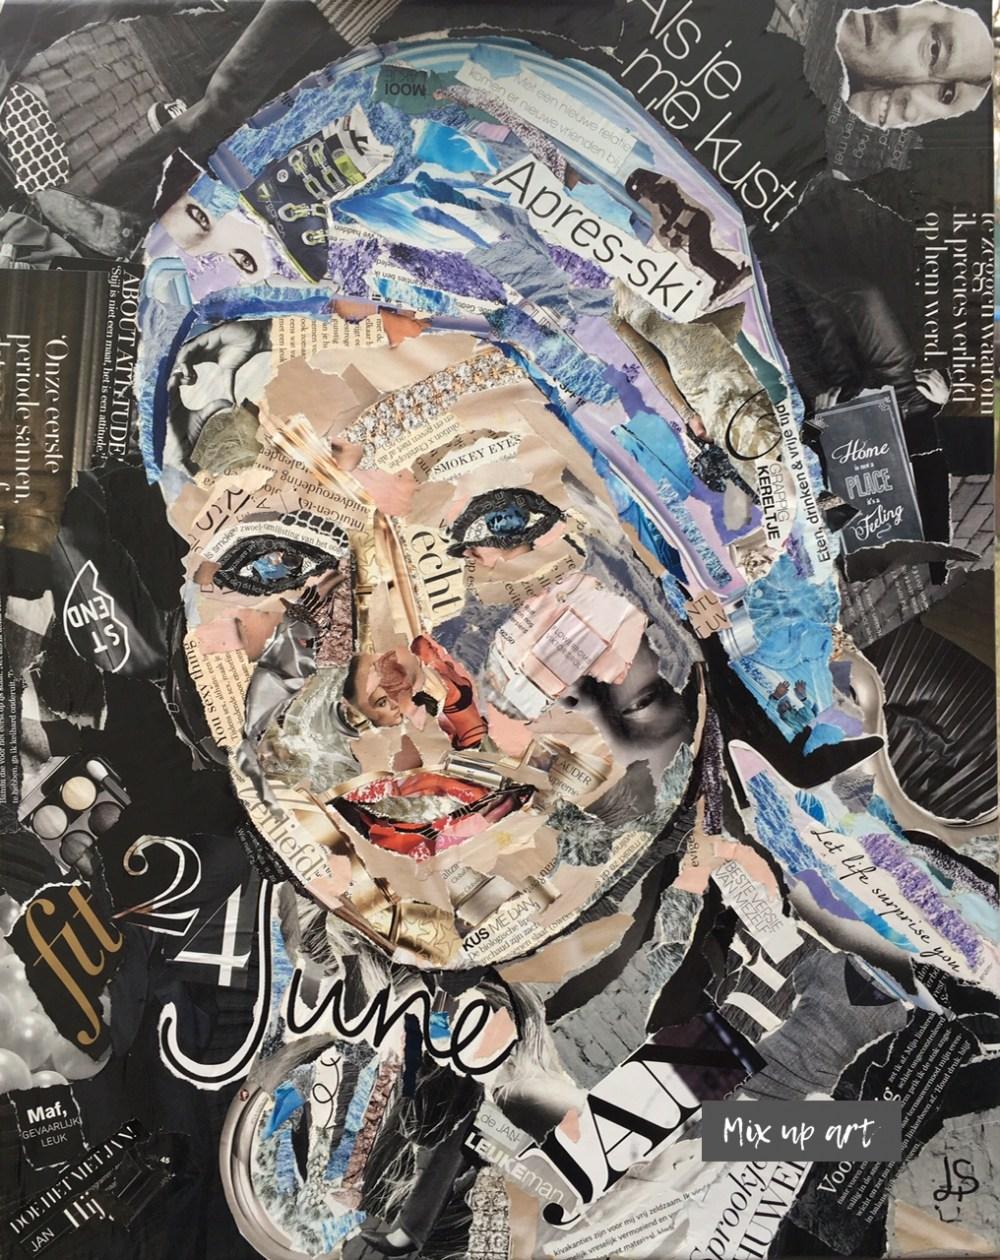 Nikolien - In opdracht - Collage (40 x 50)